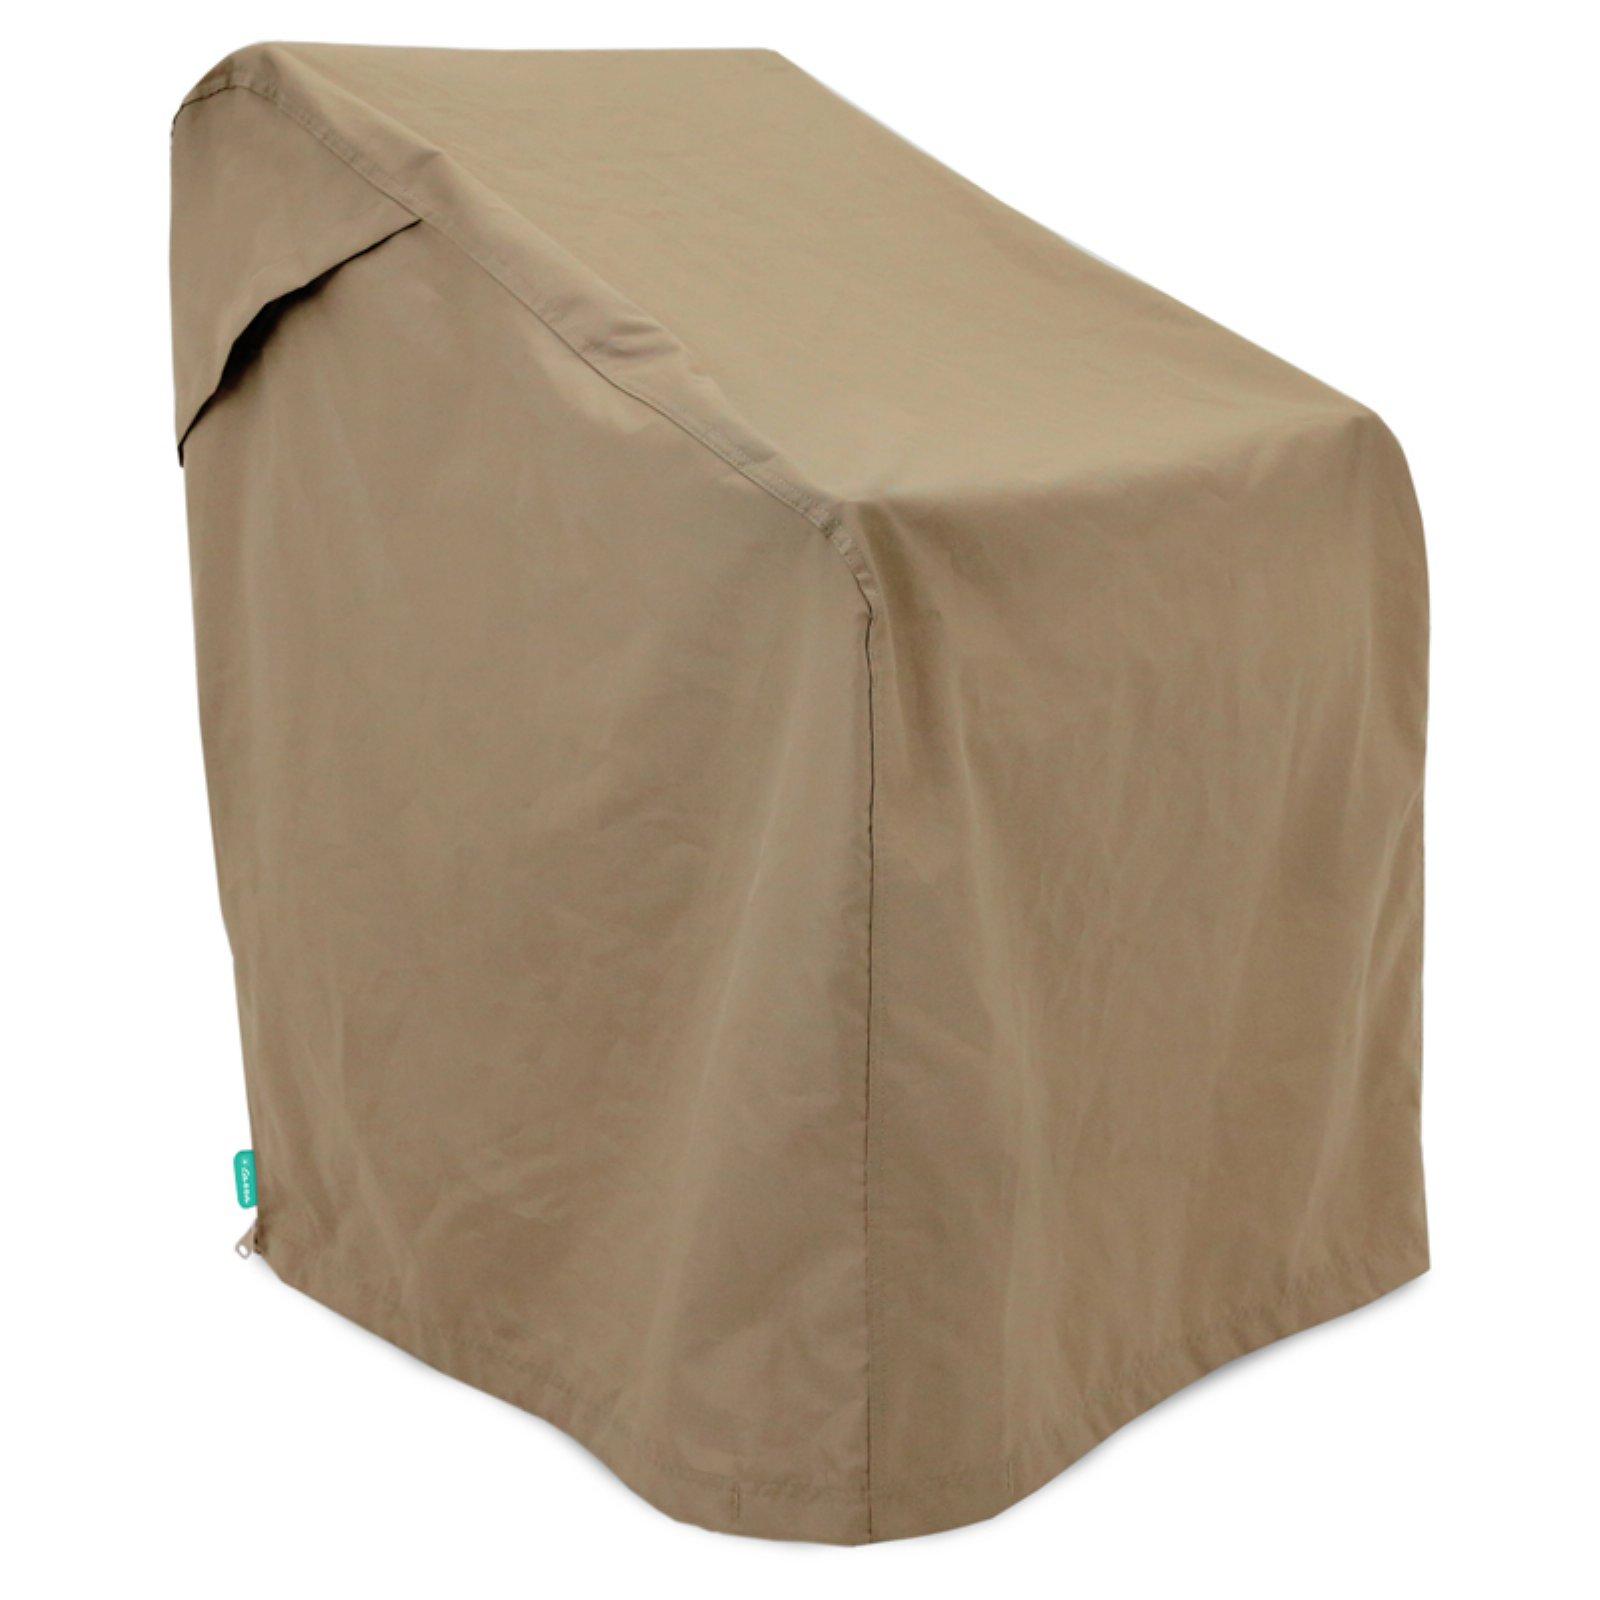 Tarra Home Universal Outdoor UFCCP243052PT Patio Chair Cover